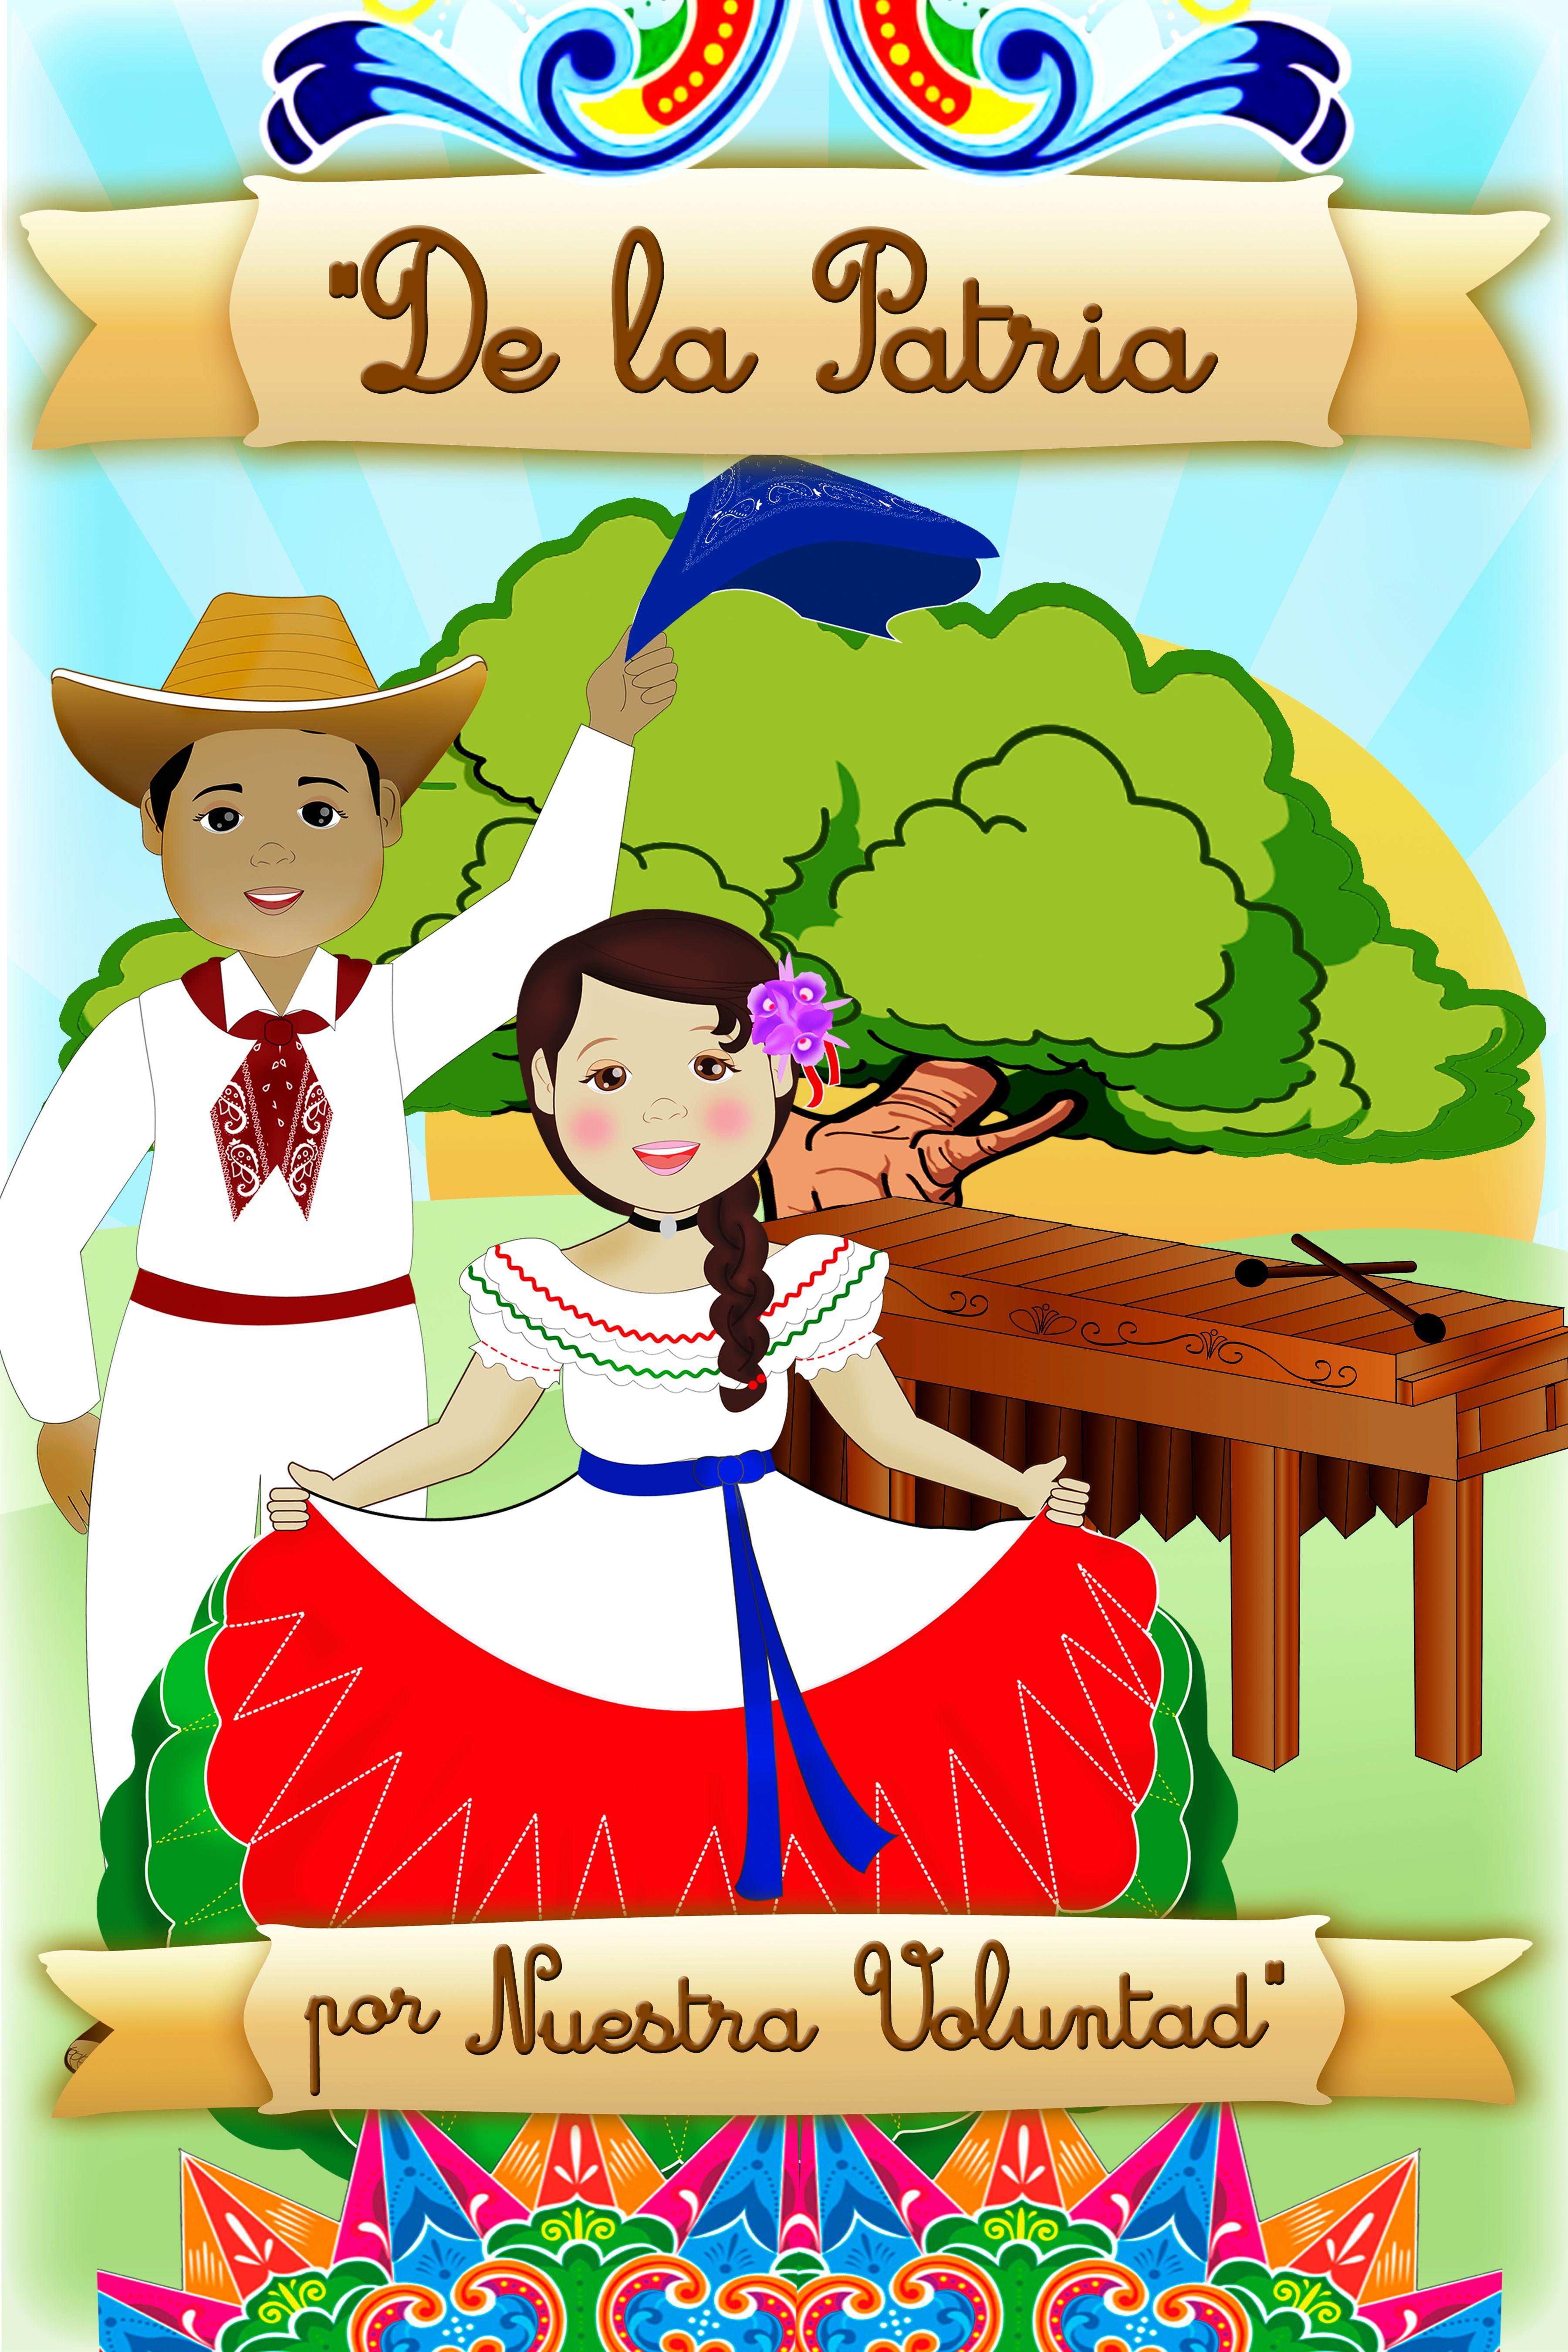 Efemerides Celebracion Anexion De Guanacaste Mexican Art Country Crafts Pura Vida